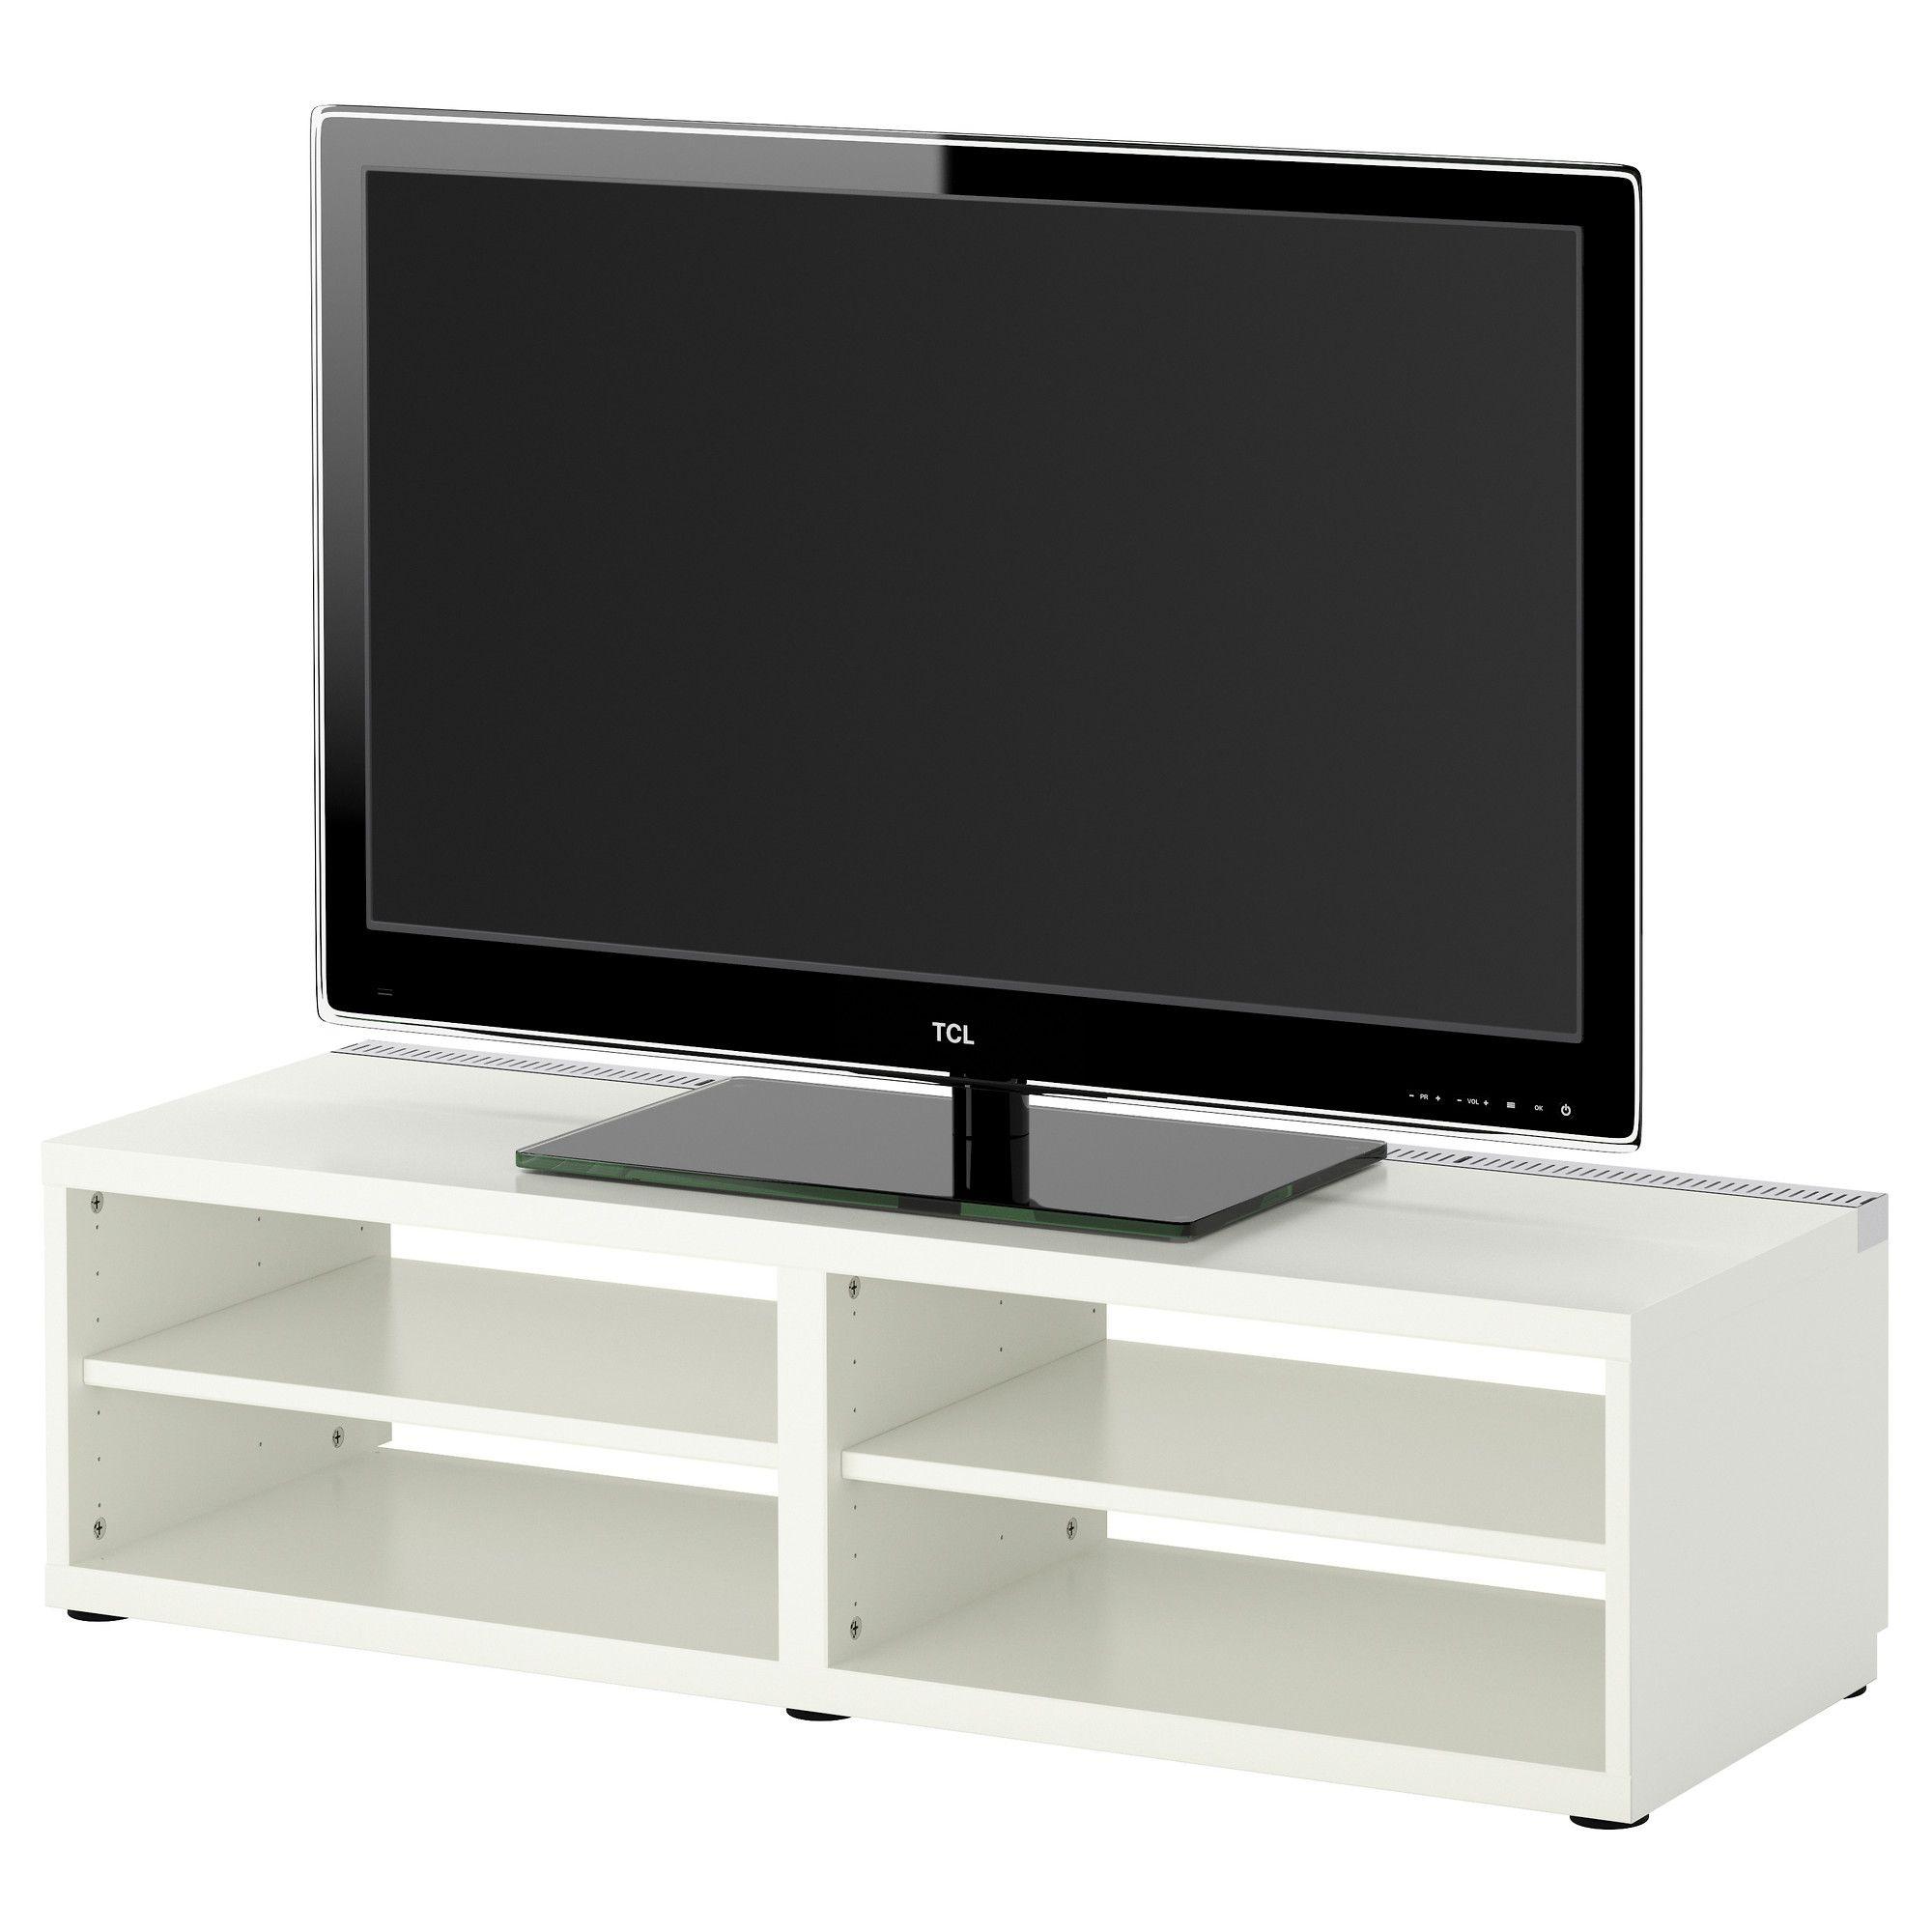 Australia Tv ikea, Ikea, Tv bench